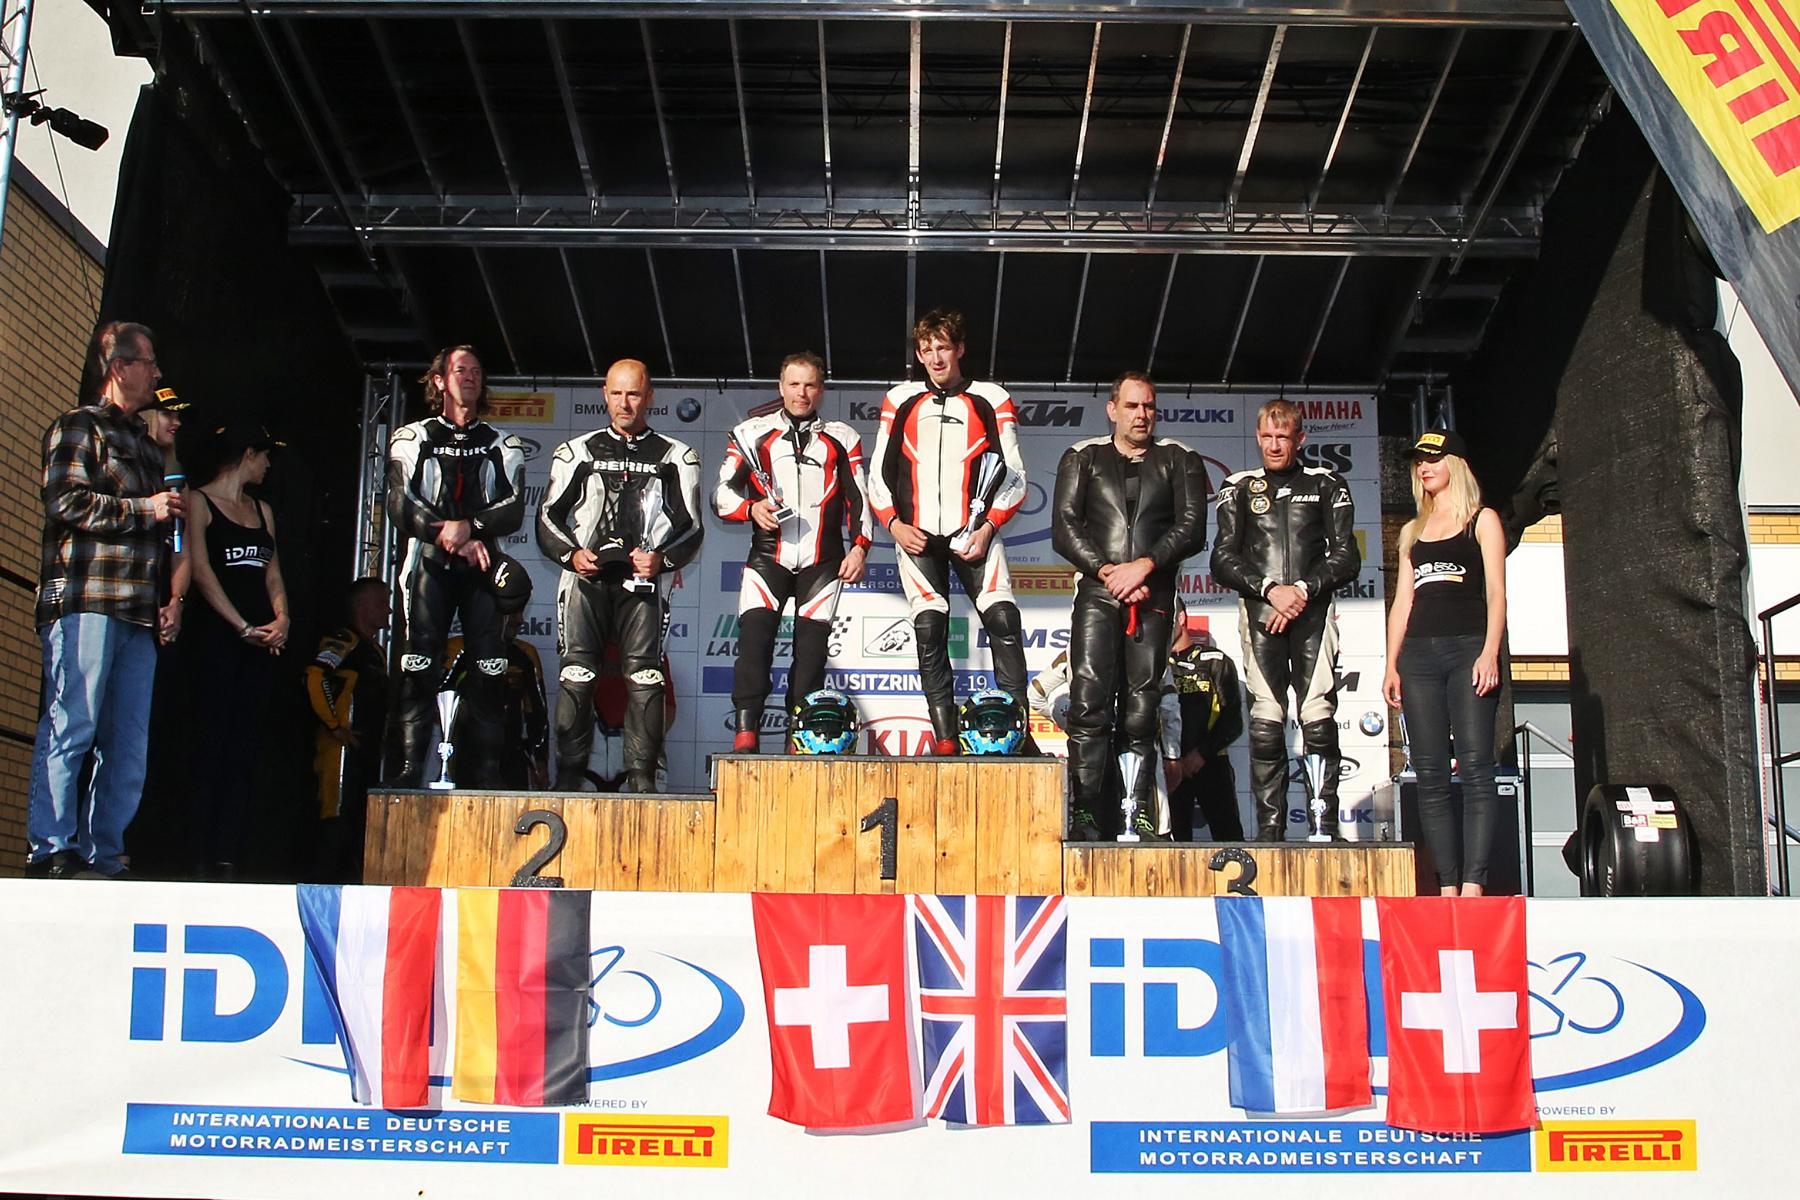 IDM Sidecar: Hirschis großer Tag als Sieger